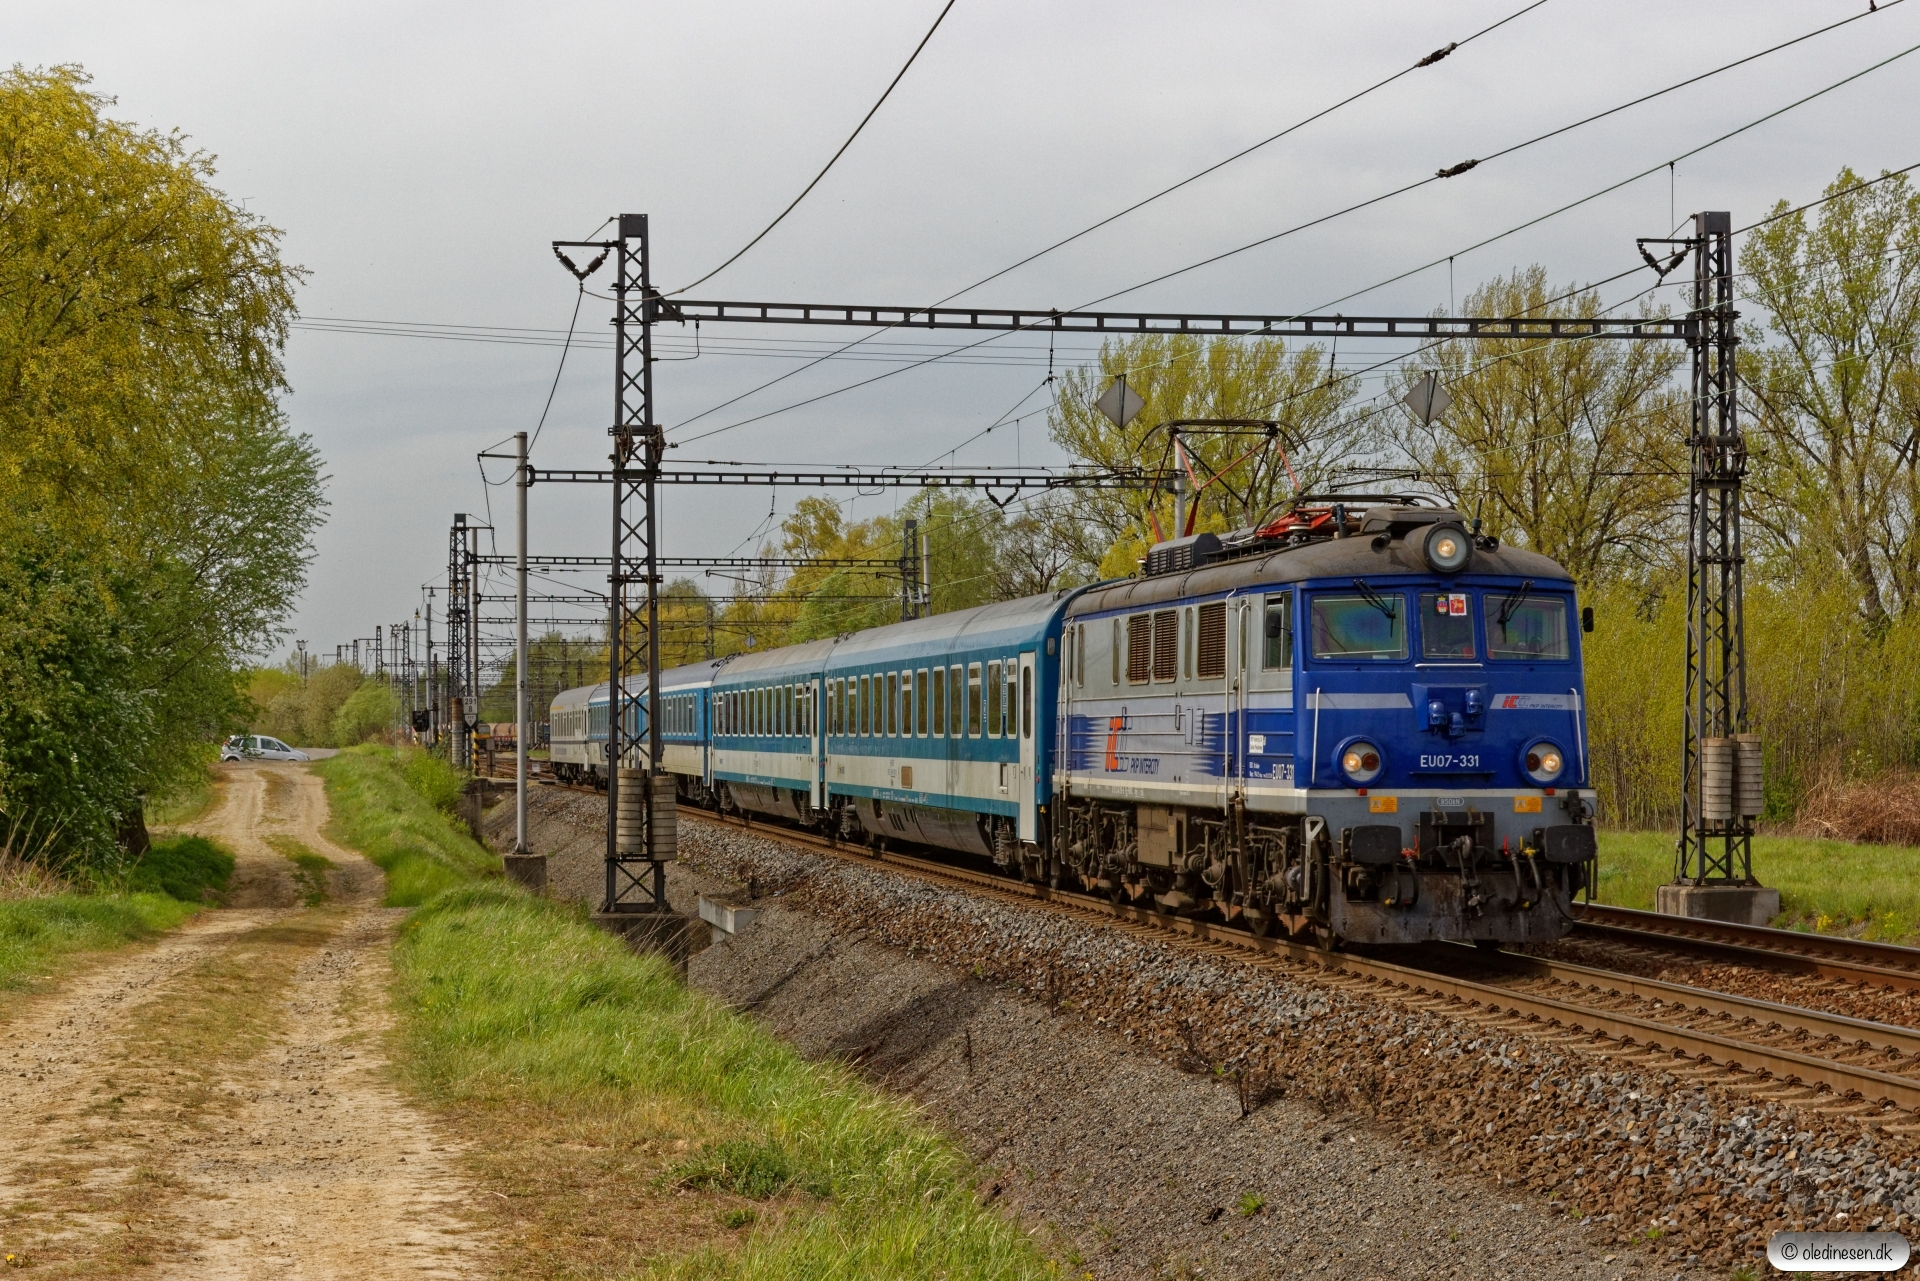 PKPIC EU07-331 med IC 115. Petrovice u Karviné (Tjekkiet) 26.04.2019 kl. 14.59.